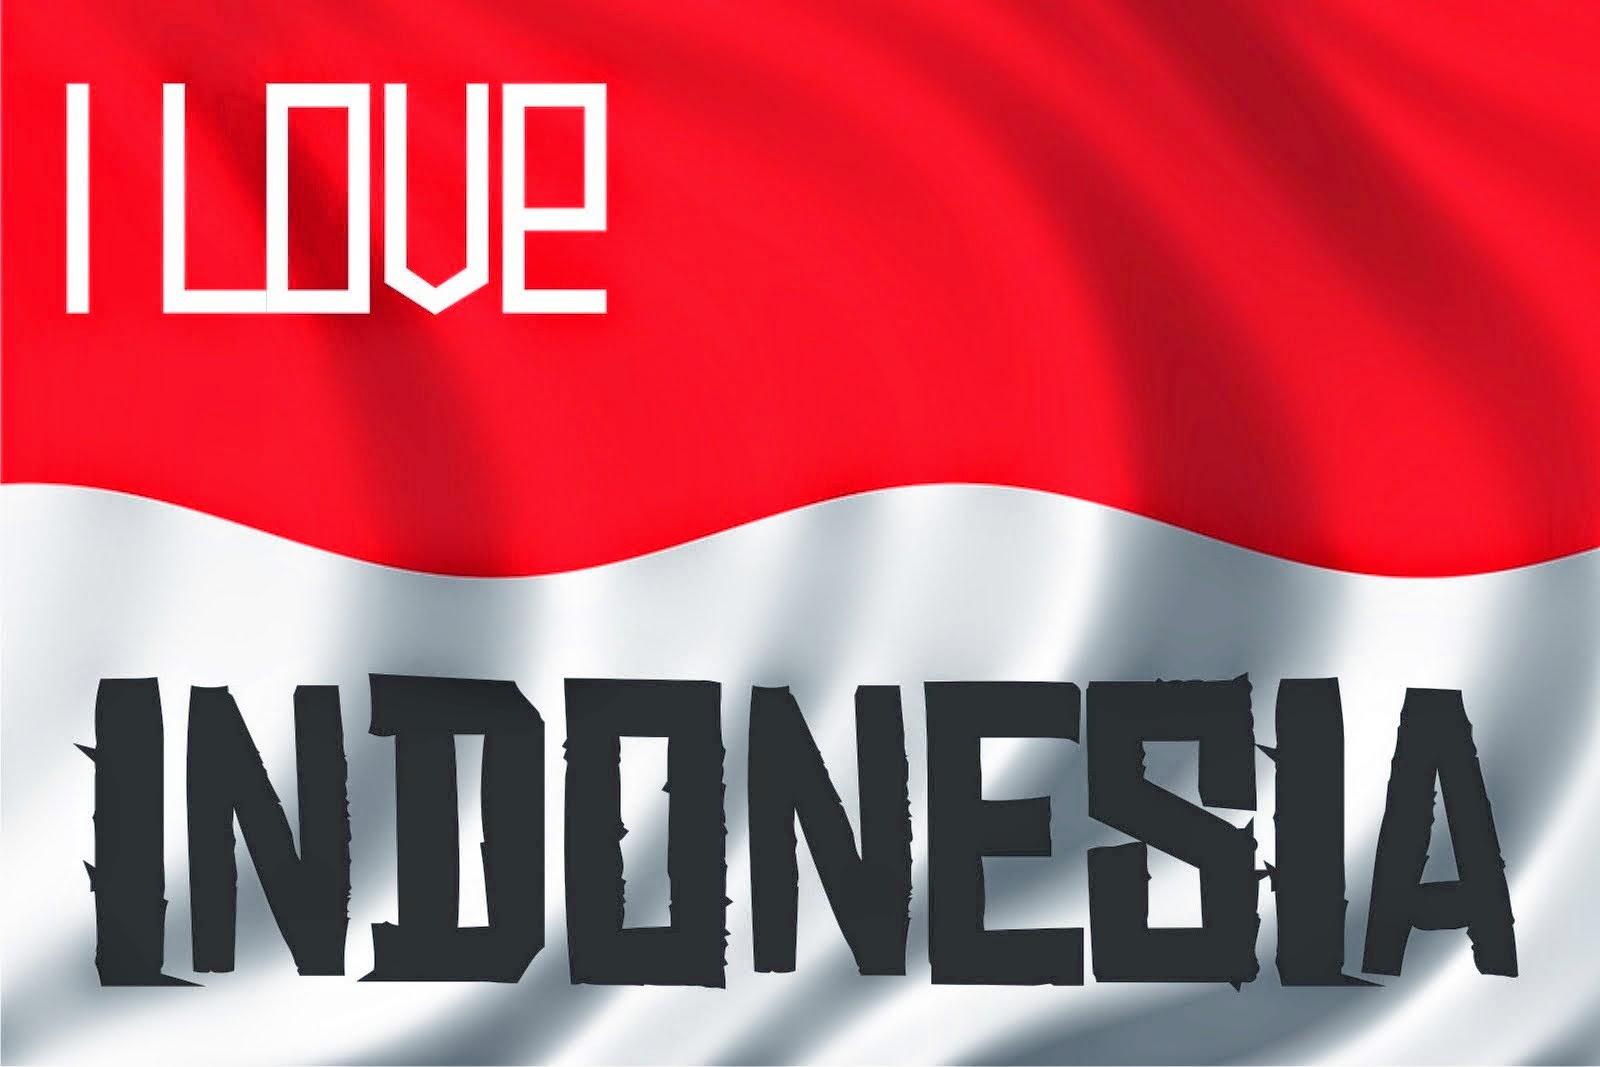 Share Ssh Gratis Indonesia 17 Juni 2014 [18 Juni Wait]